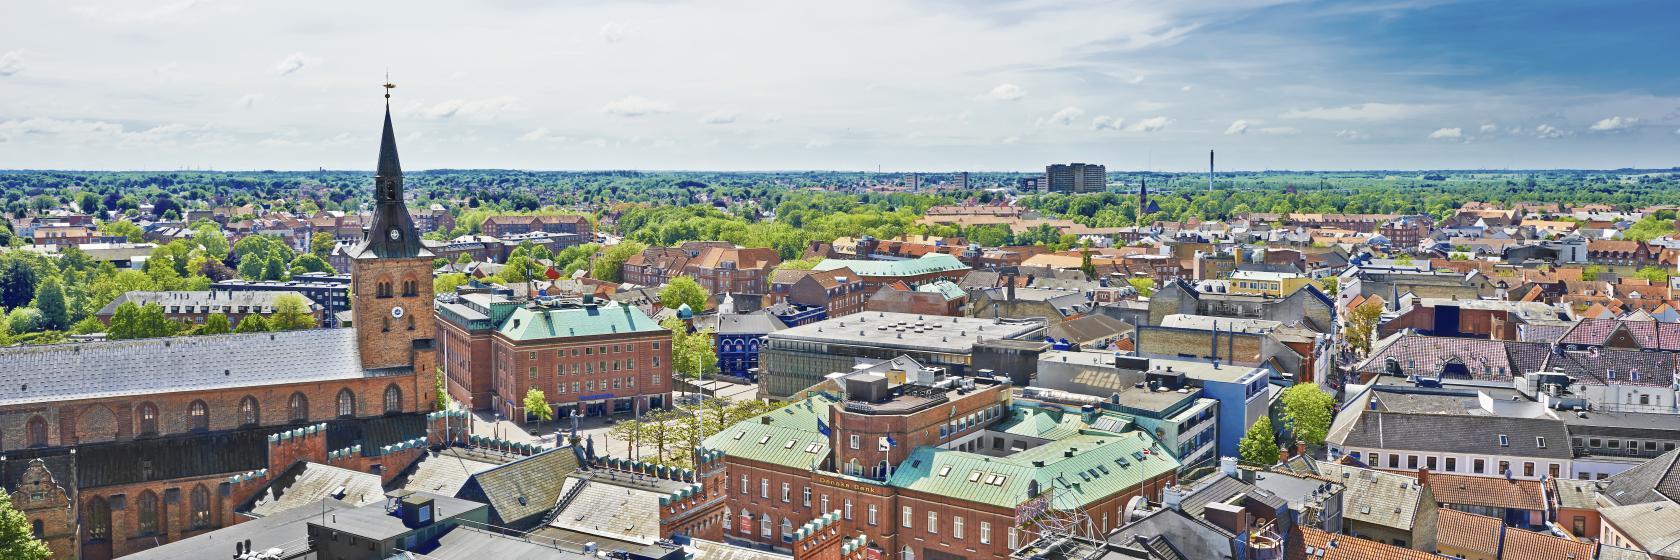 Odense Hotels & Accommodation